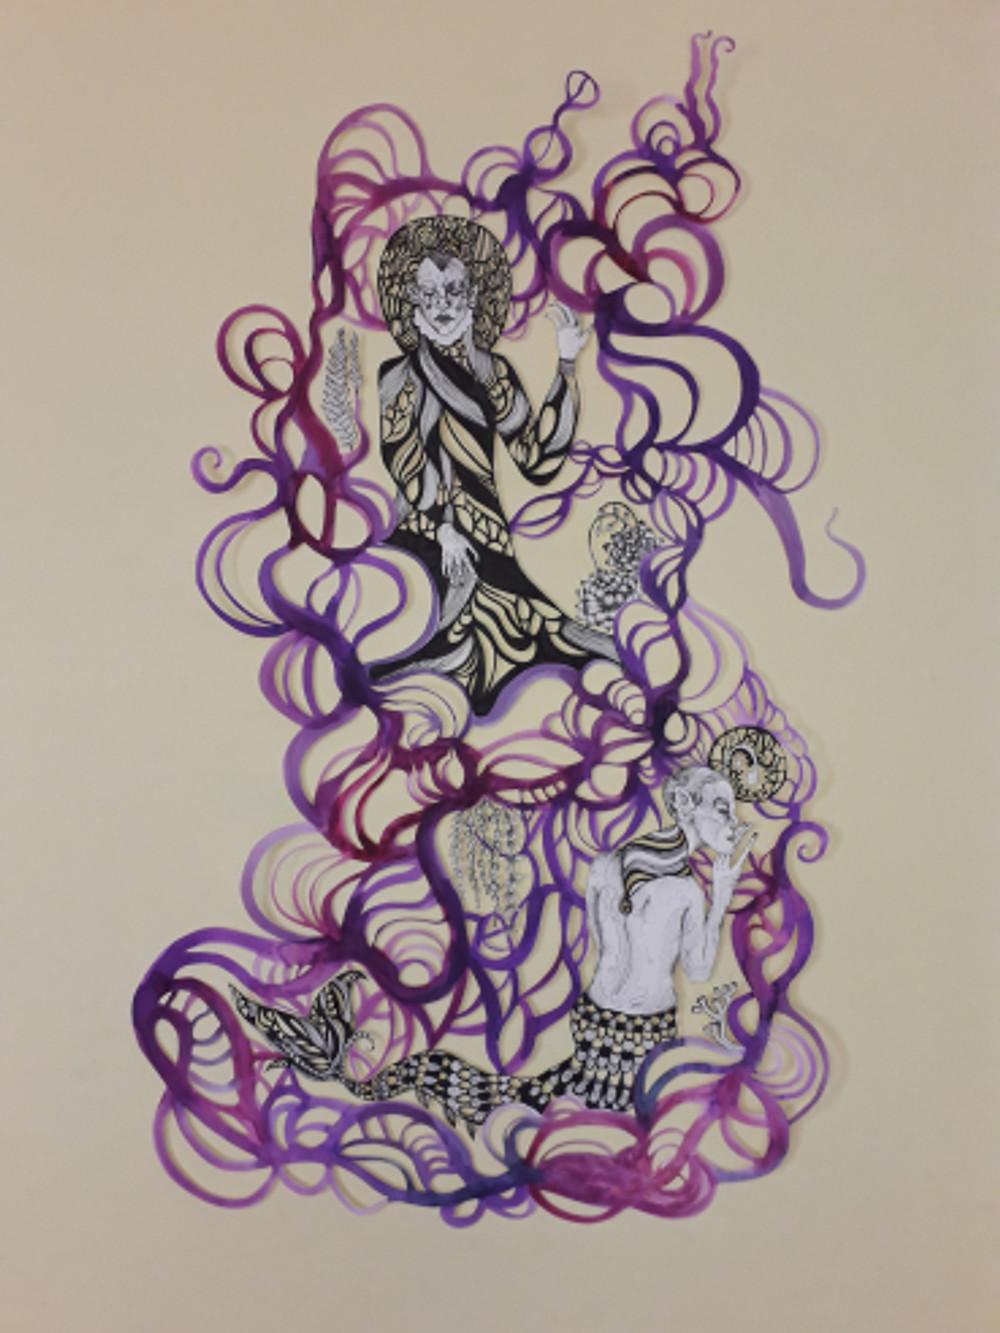 connections vol ii, part iii, 100x70 cm, paper cut figure, inking pen, watercolor, 2018